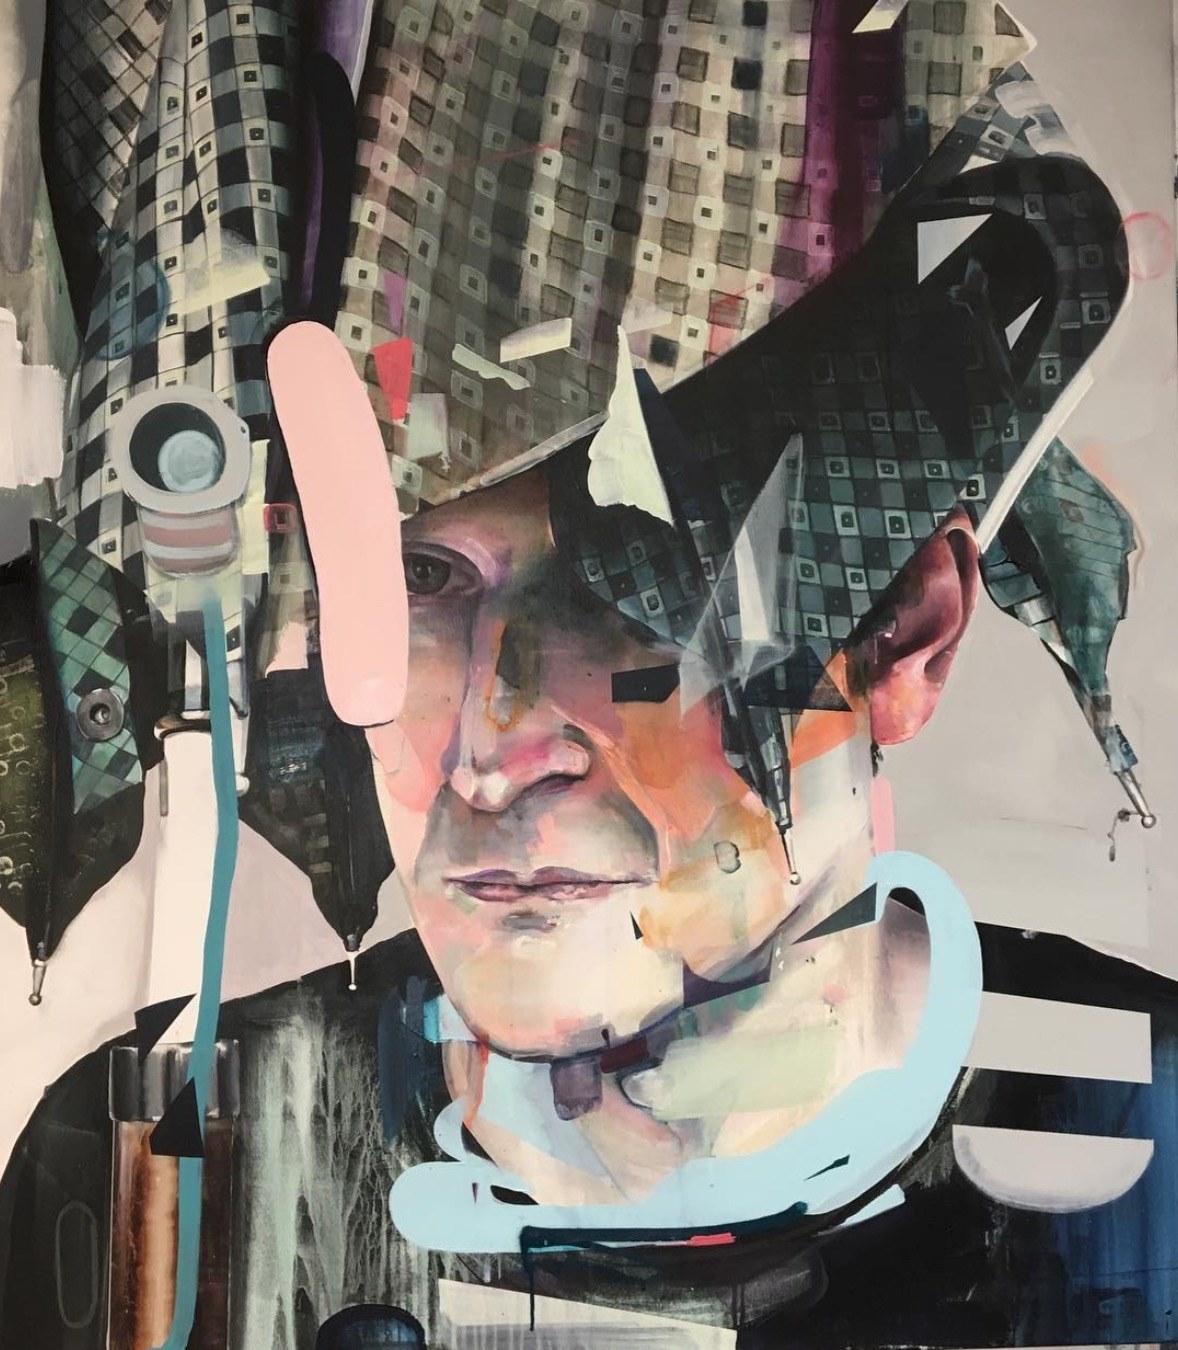 Damko  2019, 110 x 125 cm Acryl auf Leinwand  4.900 €